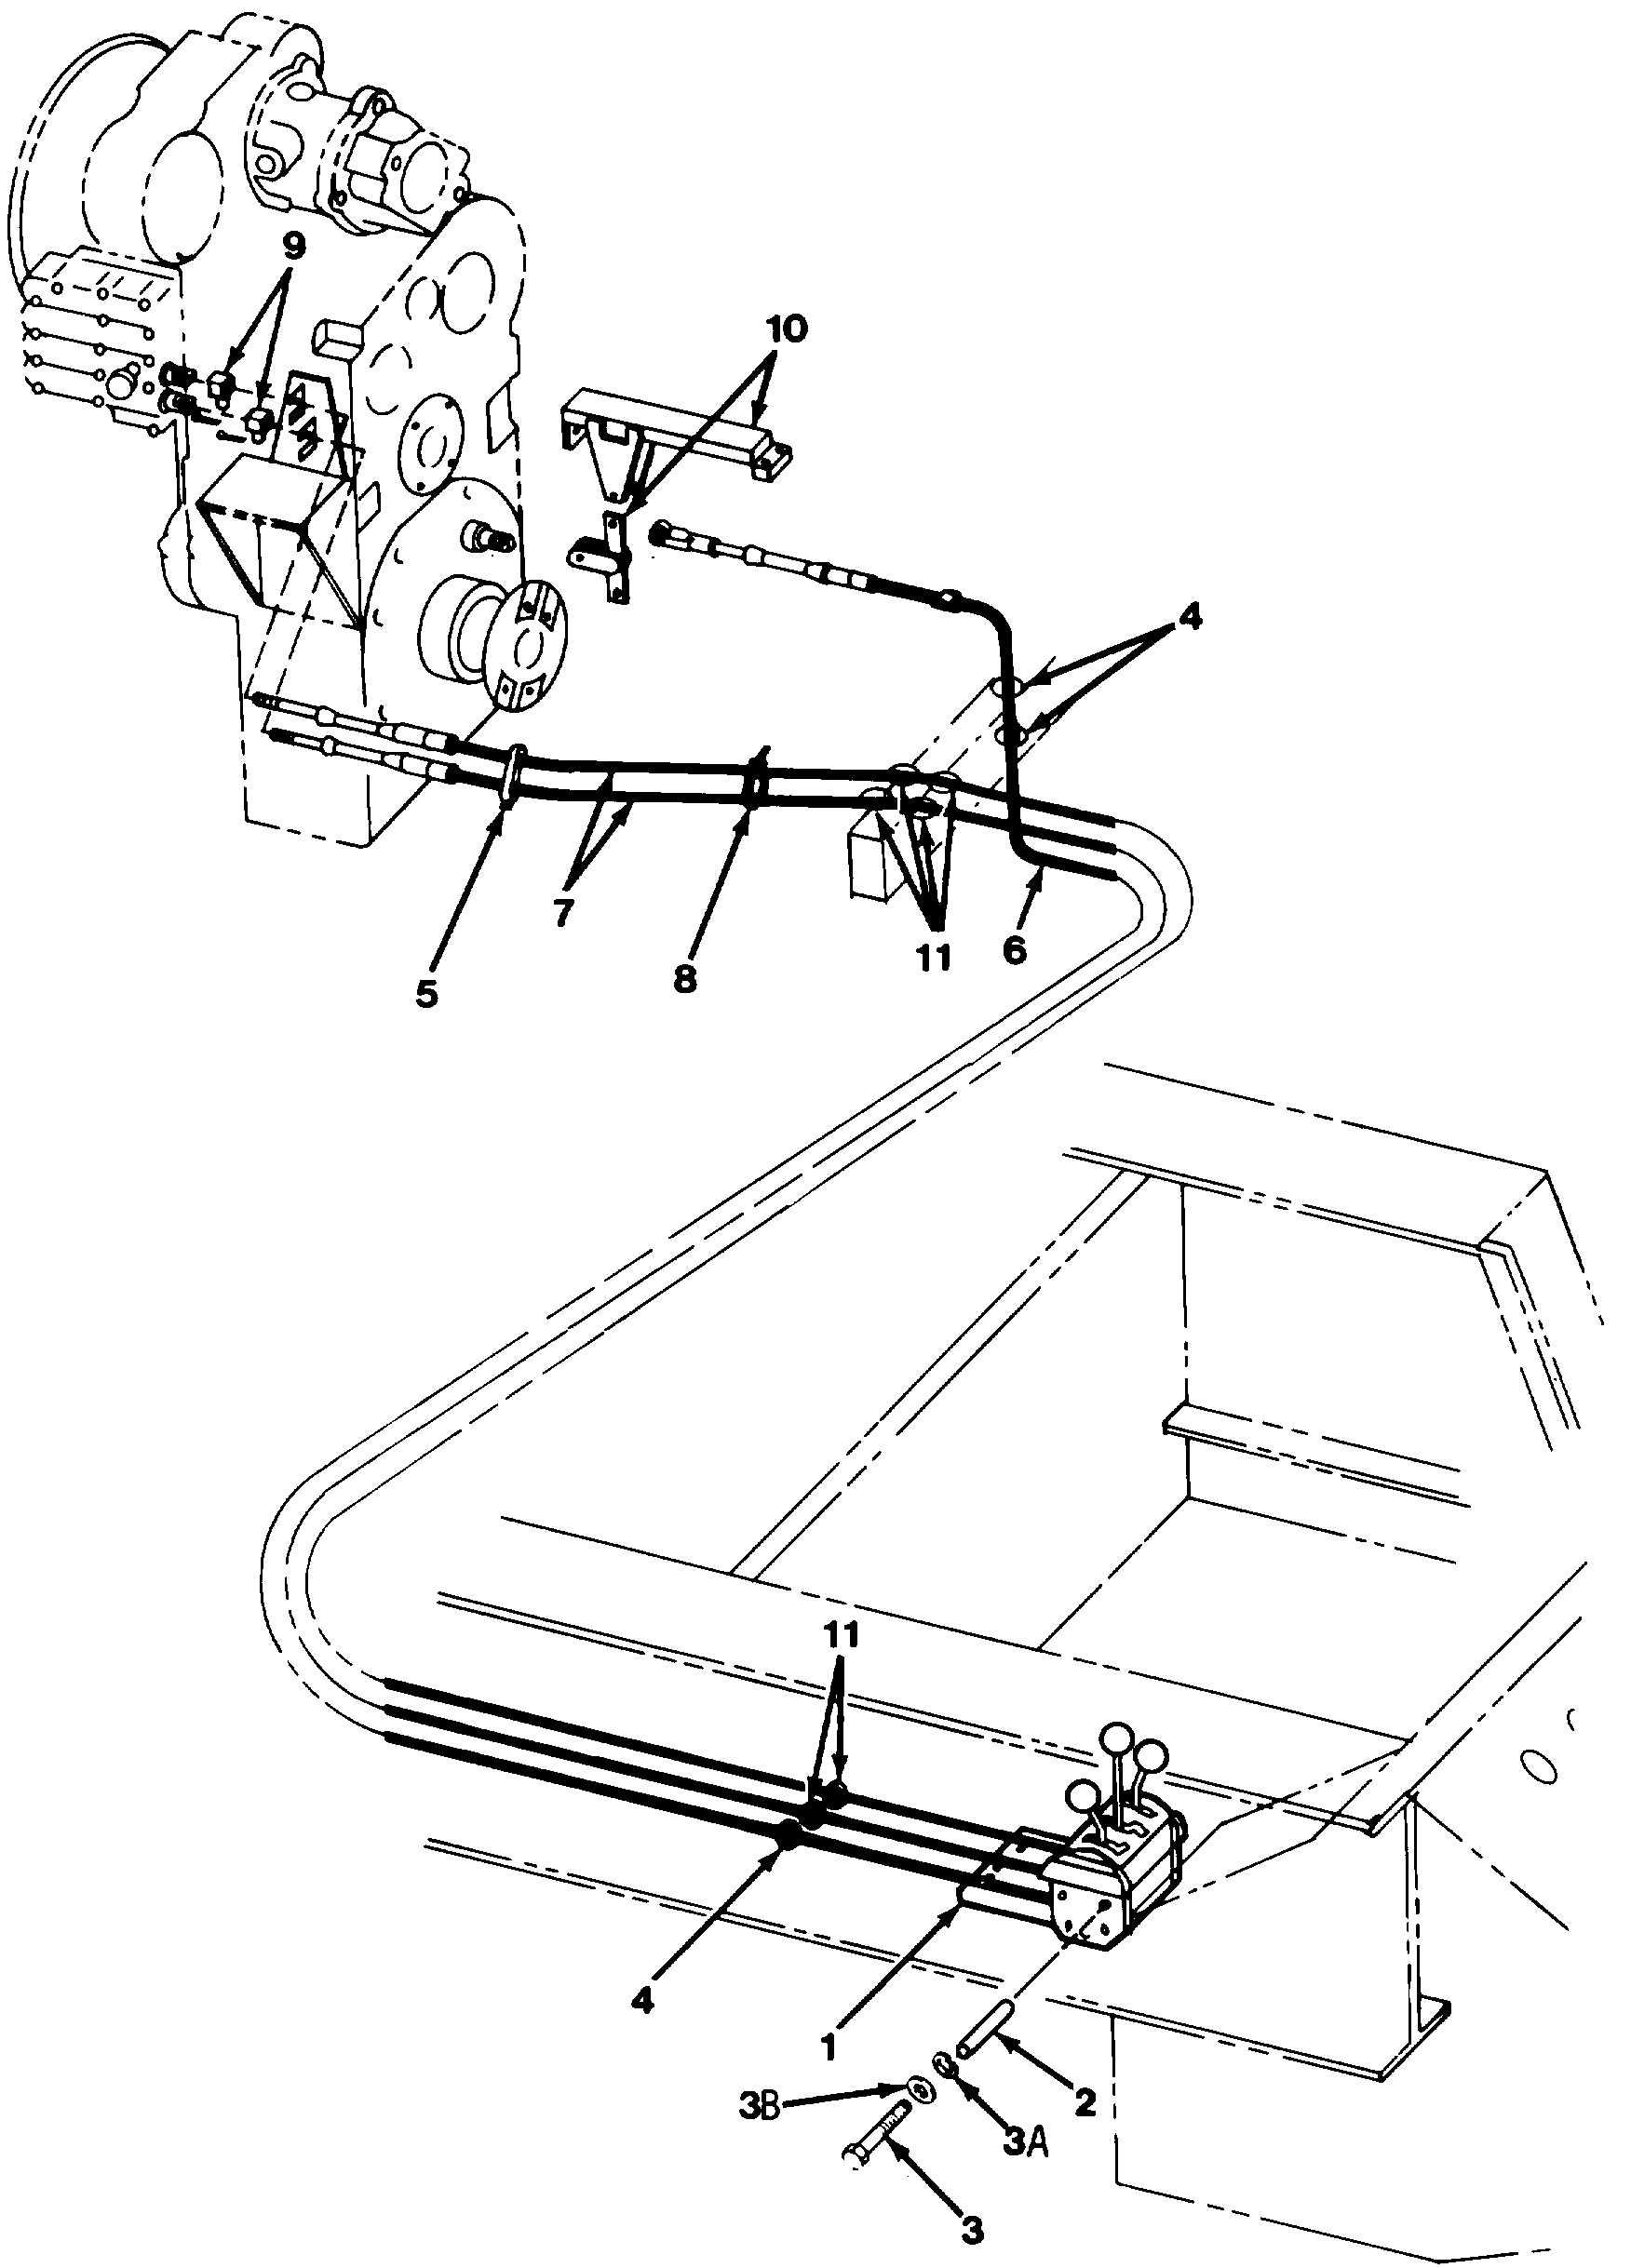 Figure 154. Type II Transmission Shift Assembly